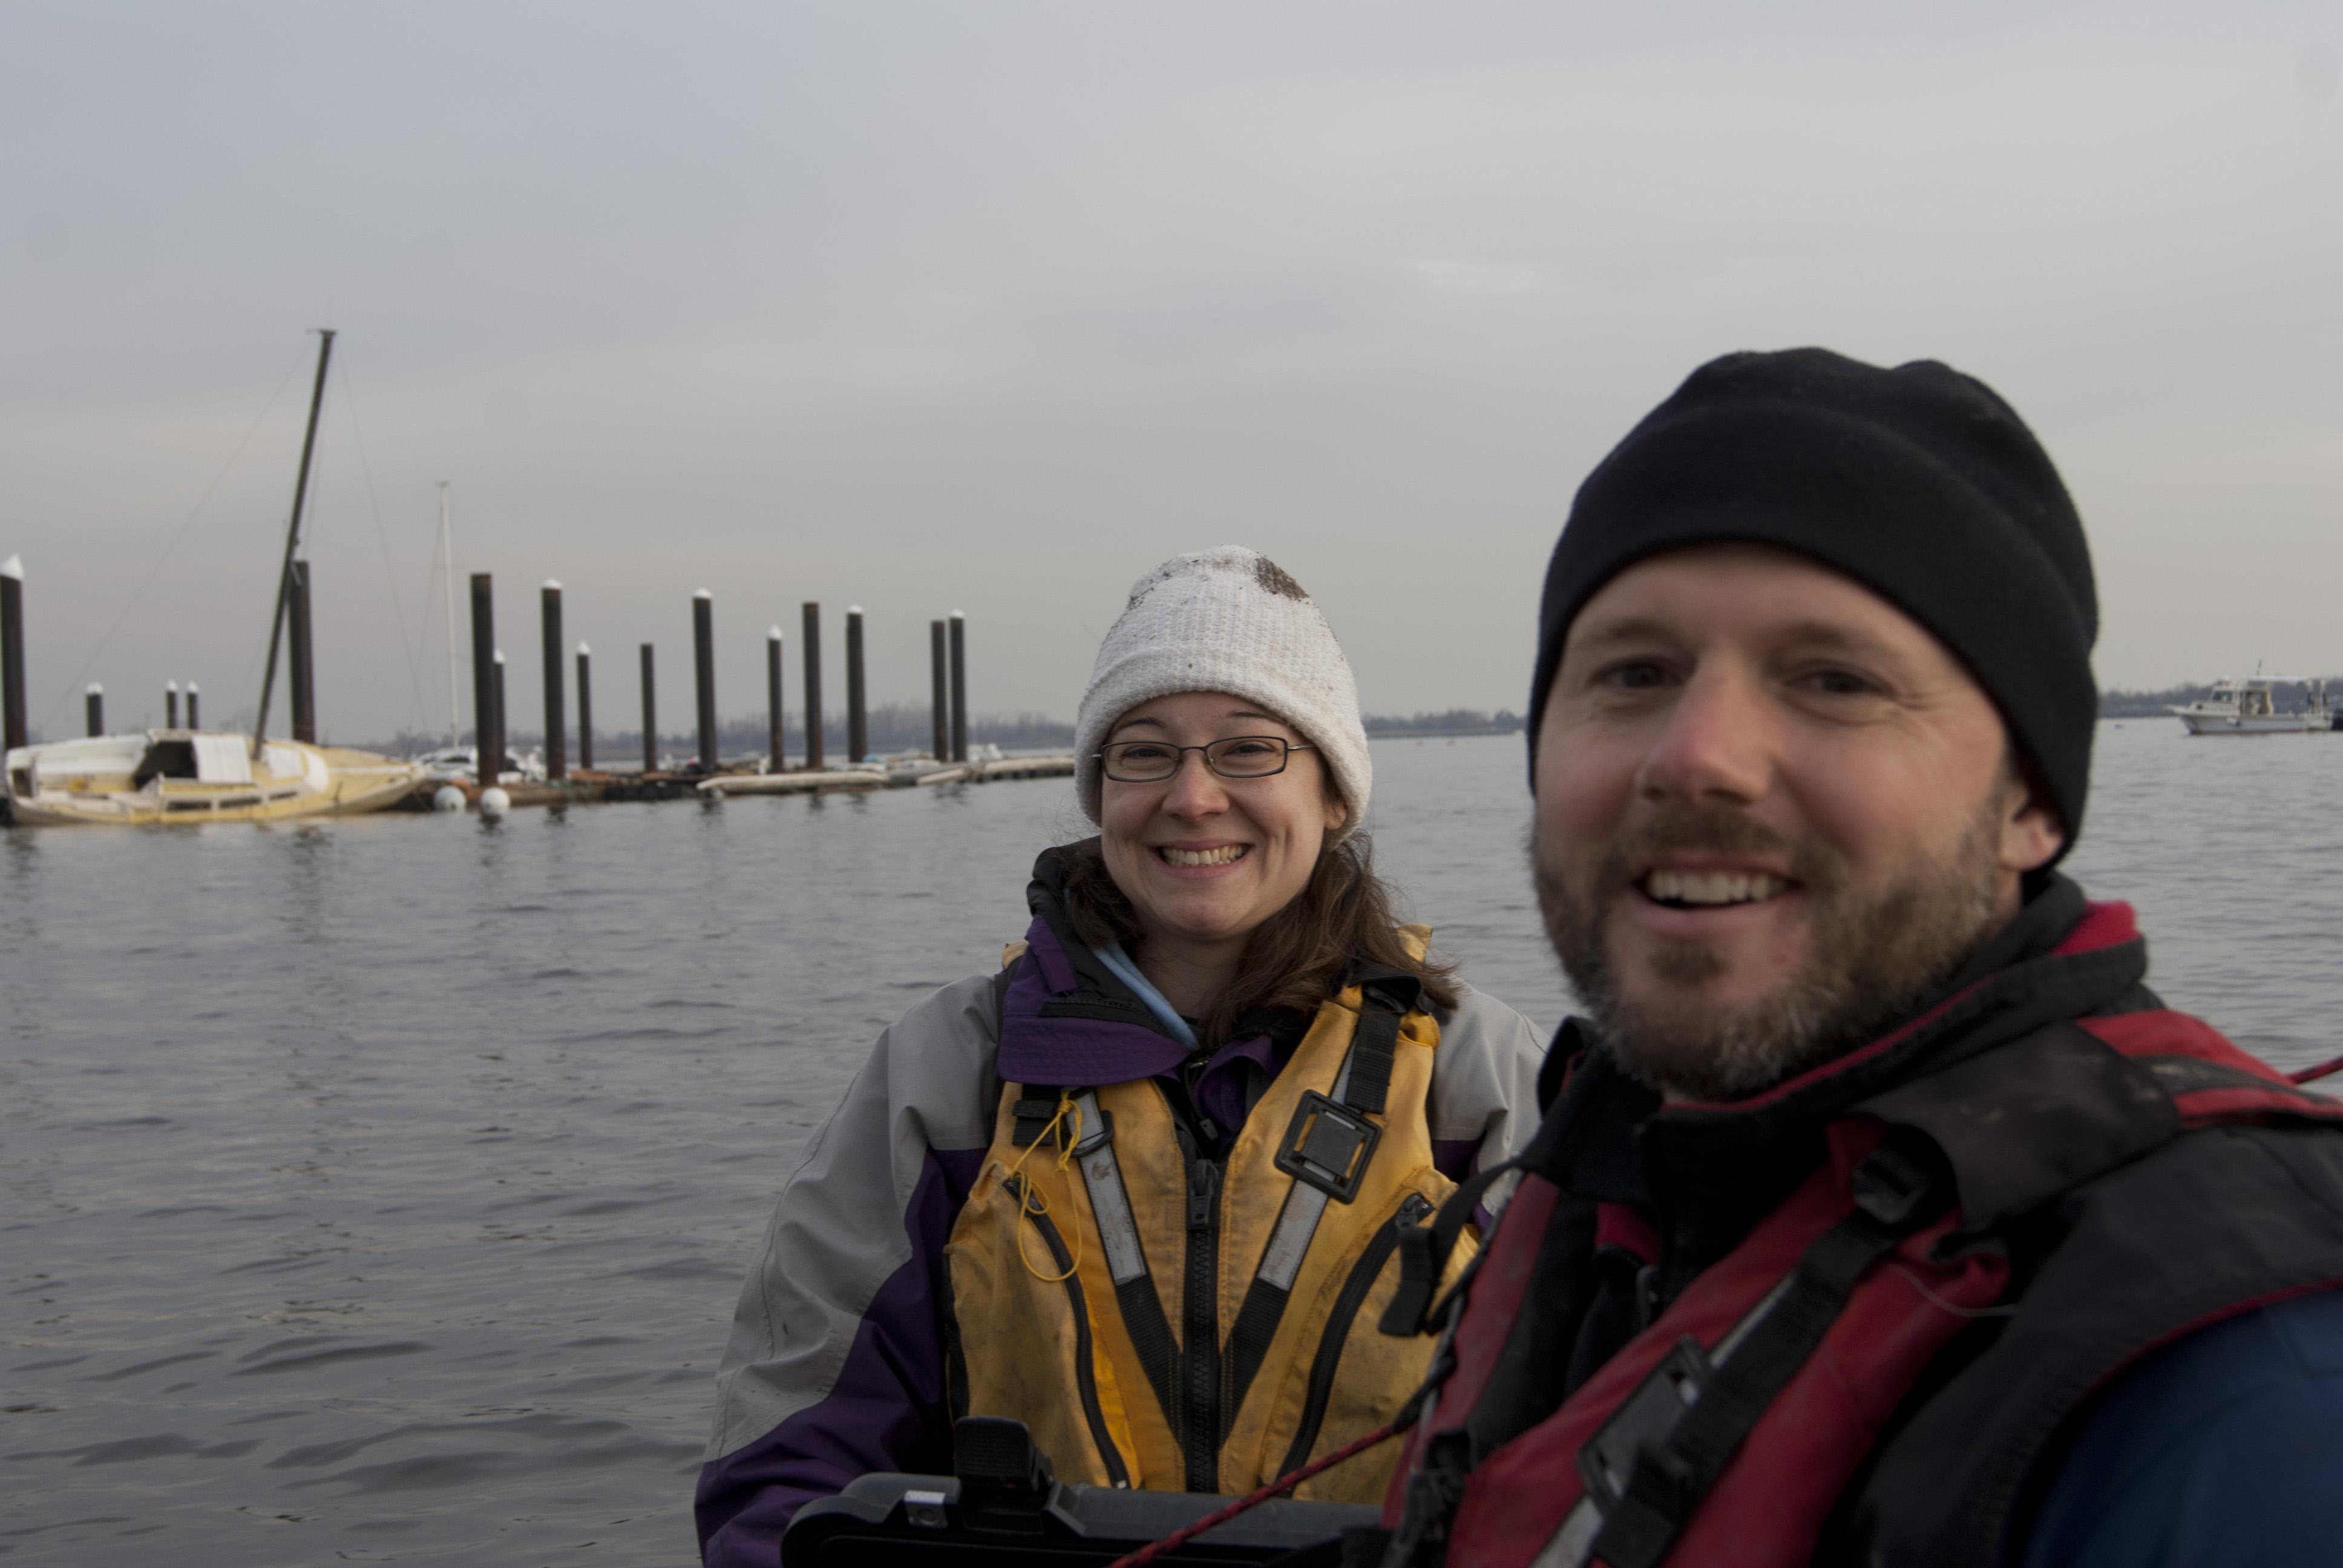 Christine Brandon and Jon Woodruff, University of Massachusetts at Amherst